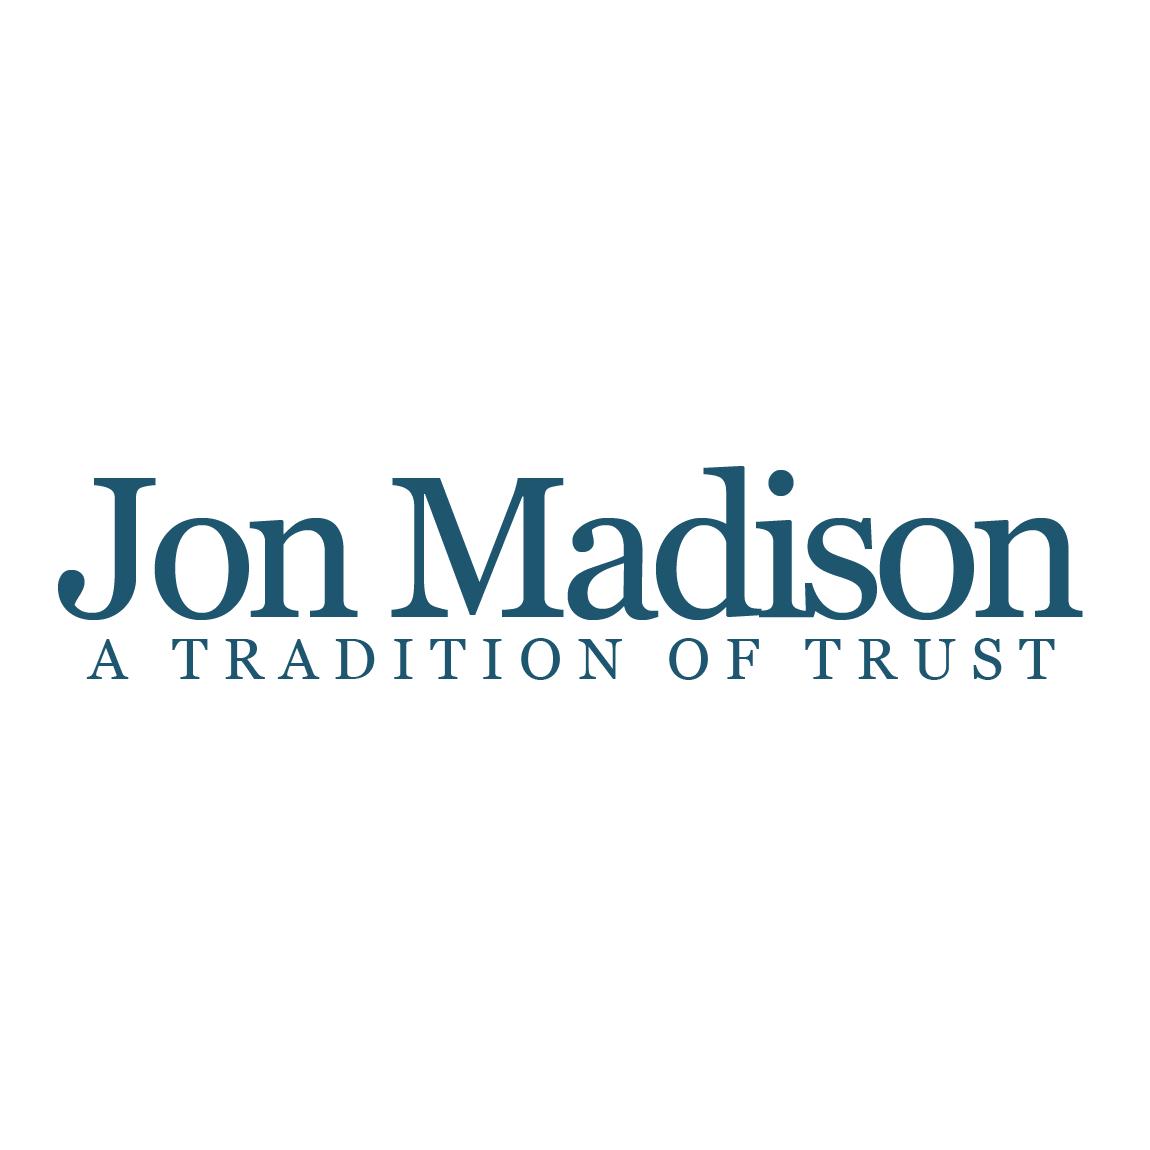 Jon Madison at Doug Madison Realty